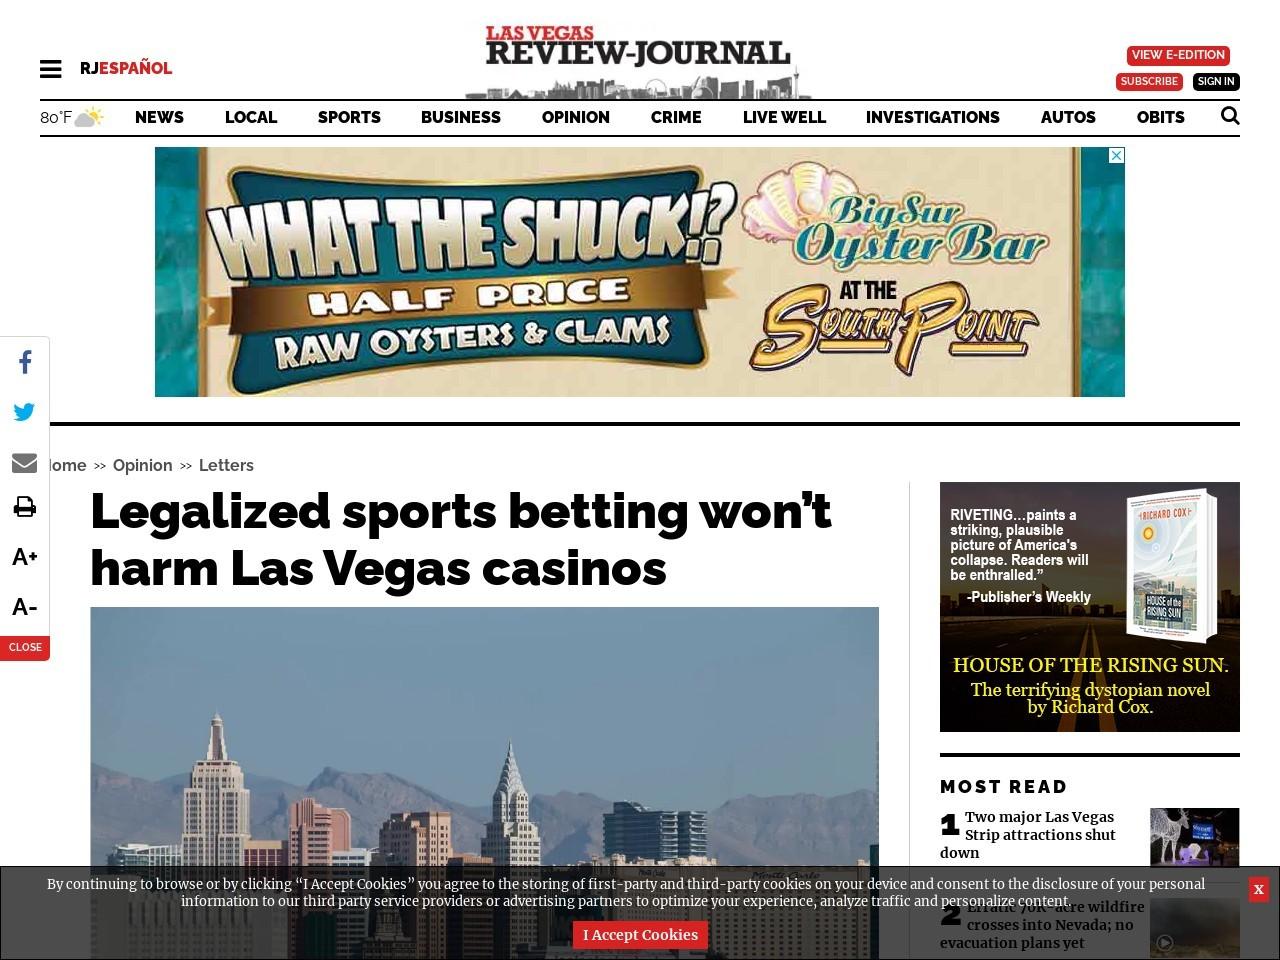 Legalized sports betting won't harm Las Vegas casinos